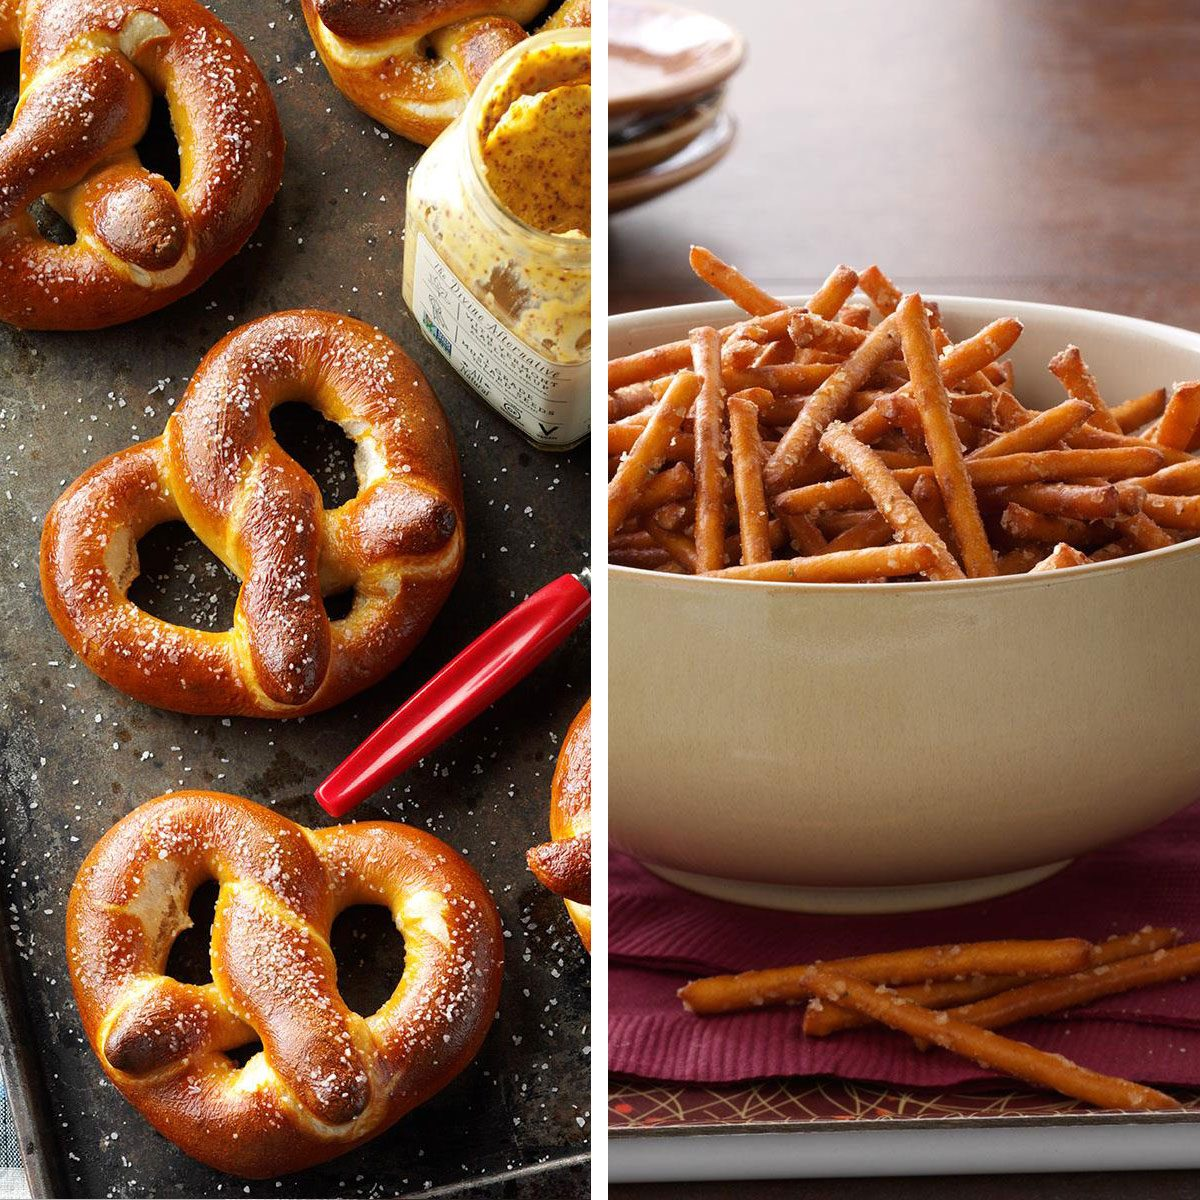 Soft-baked pretzels vs hard pretzels